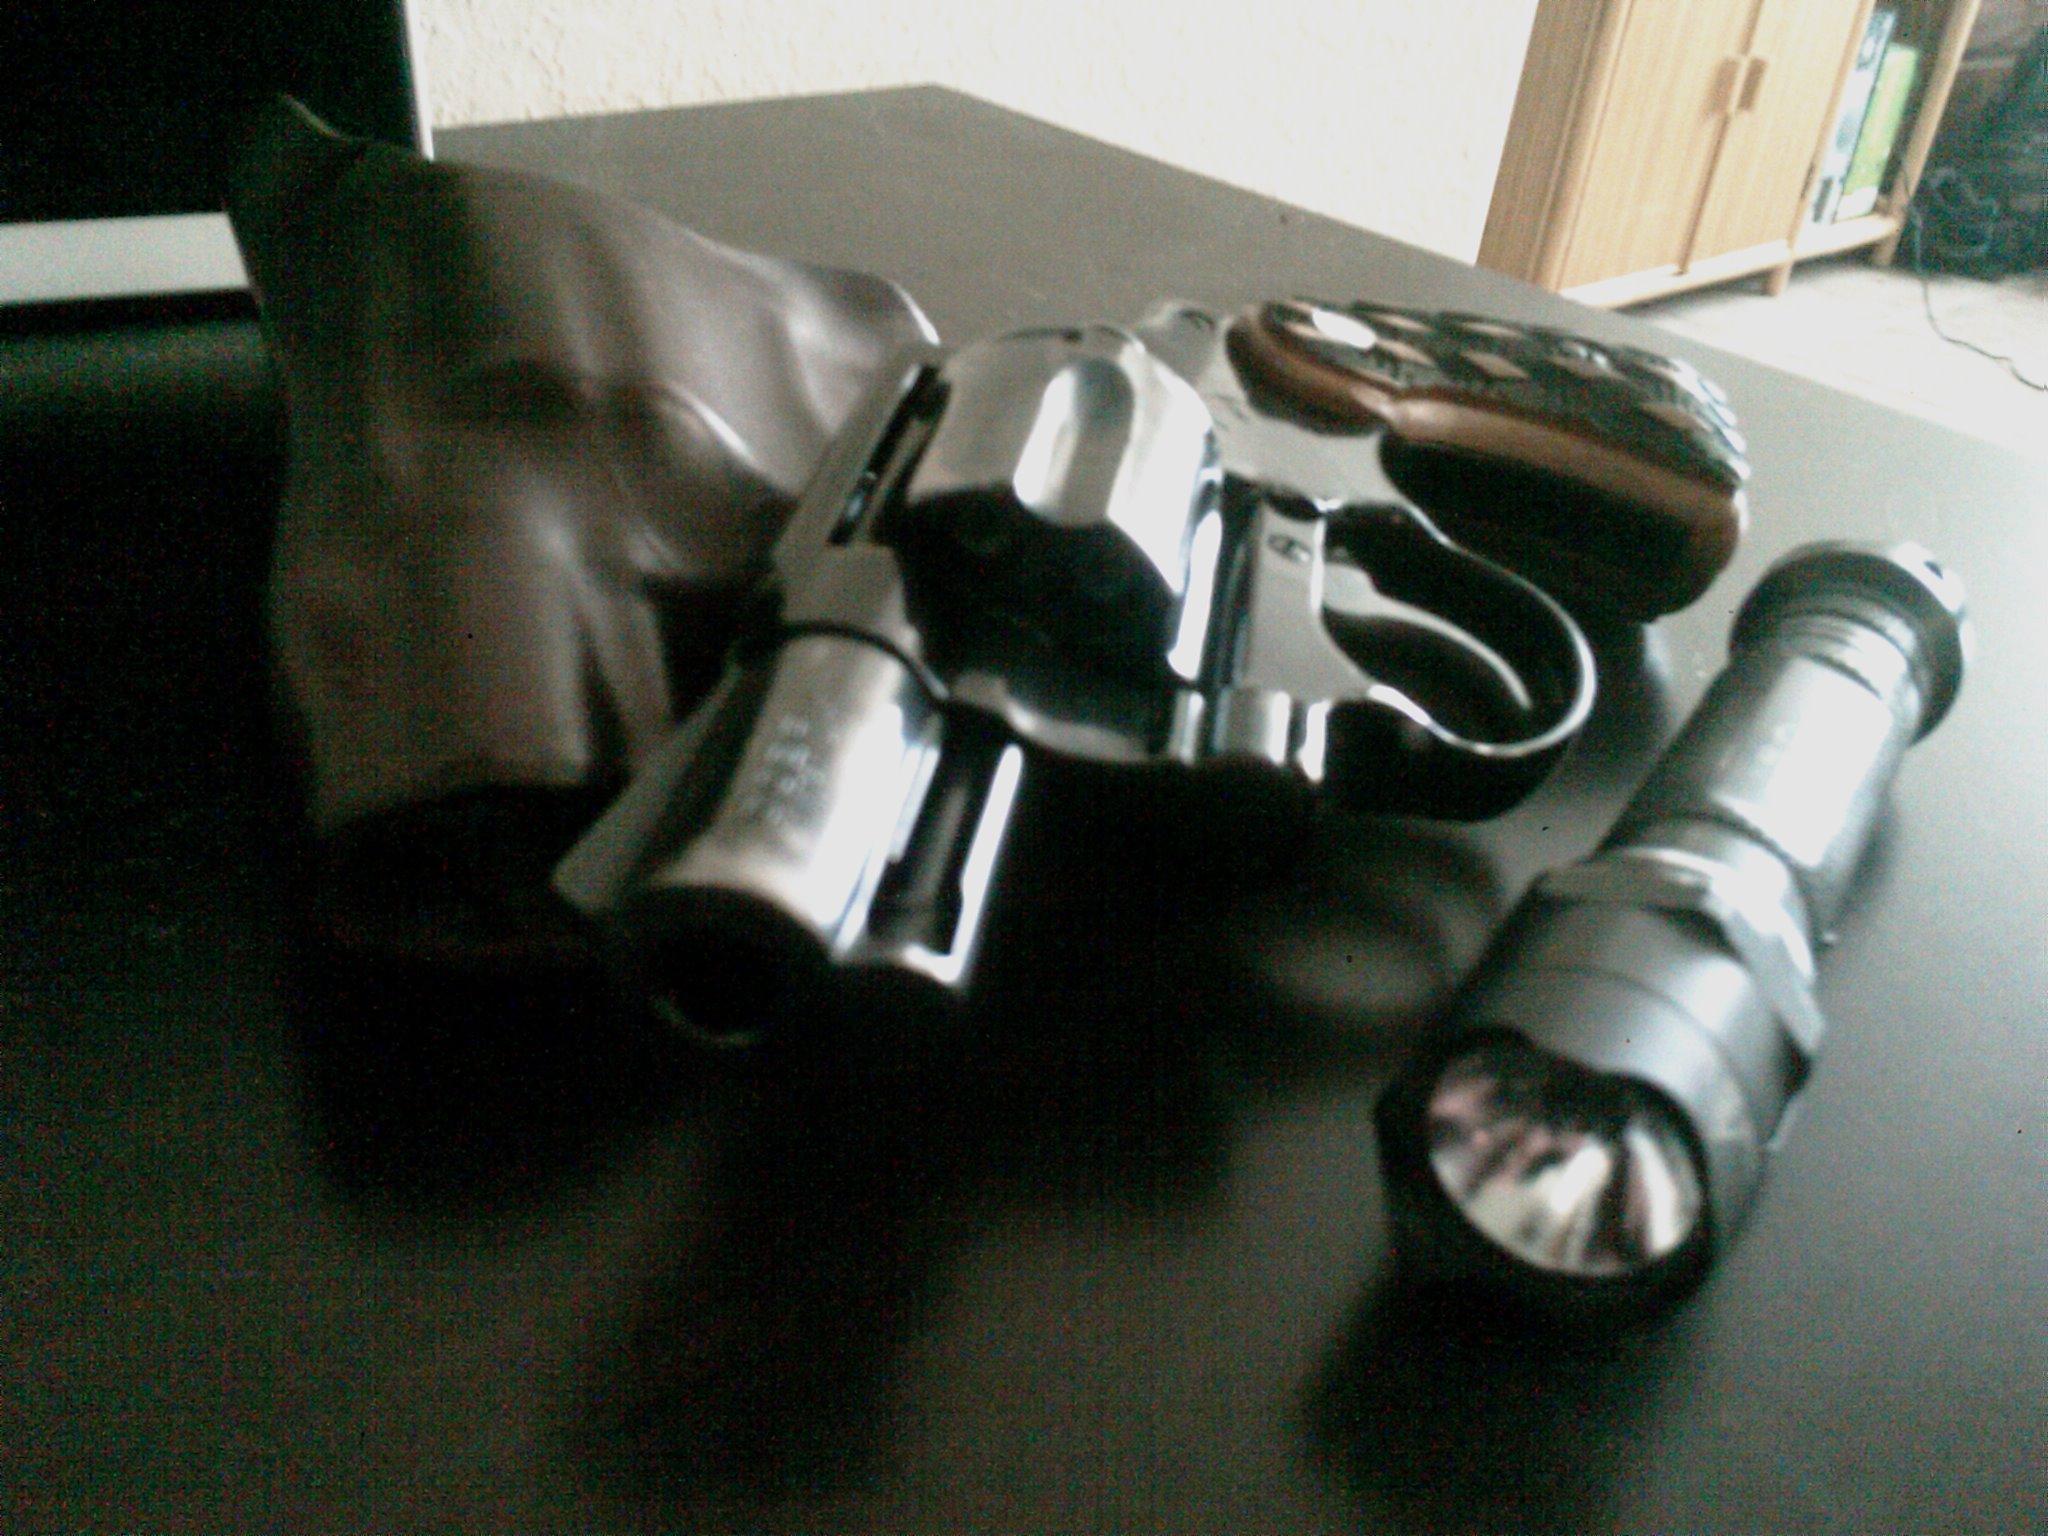 My Colt cobra with it's new tweak-imag0161.jpg